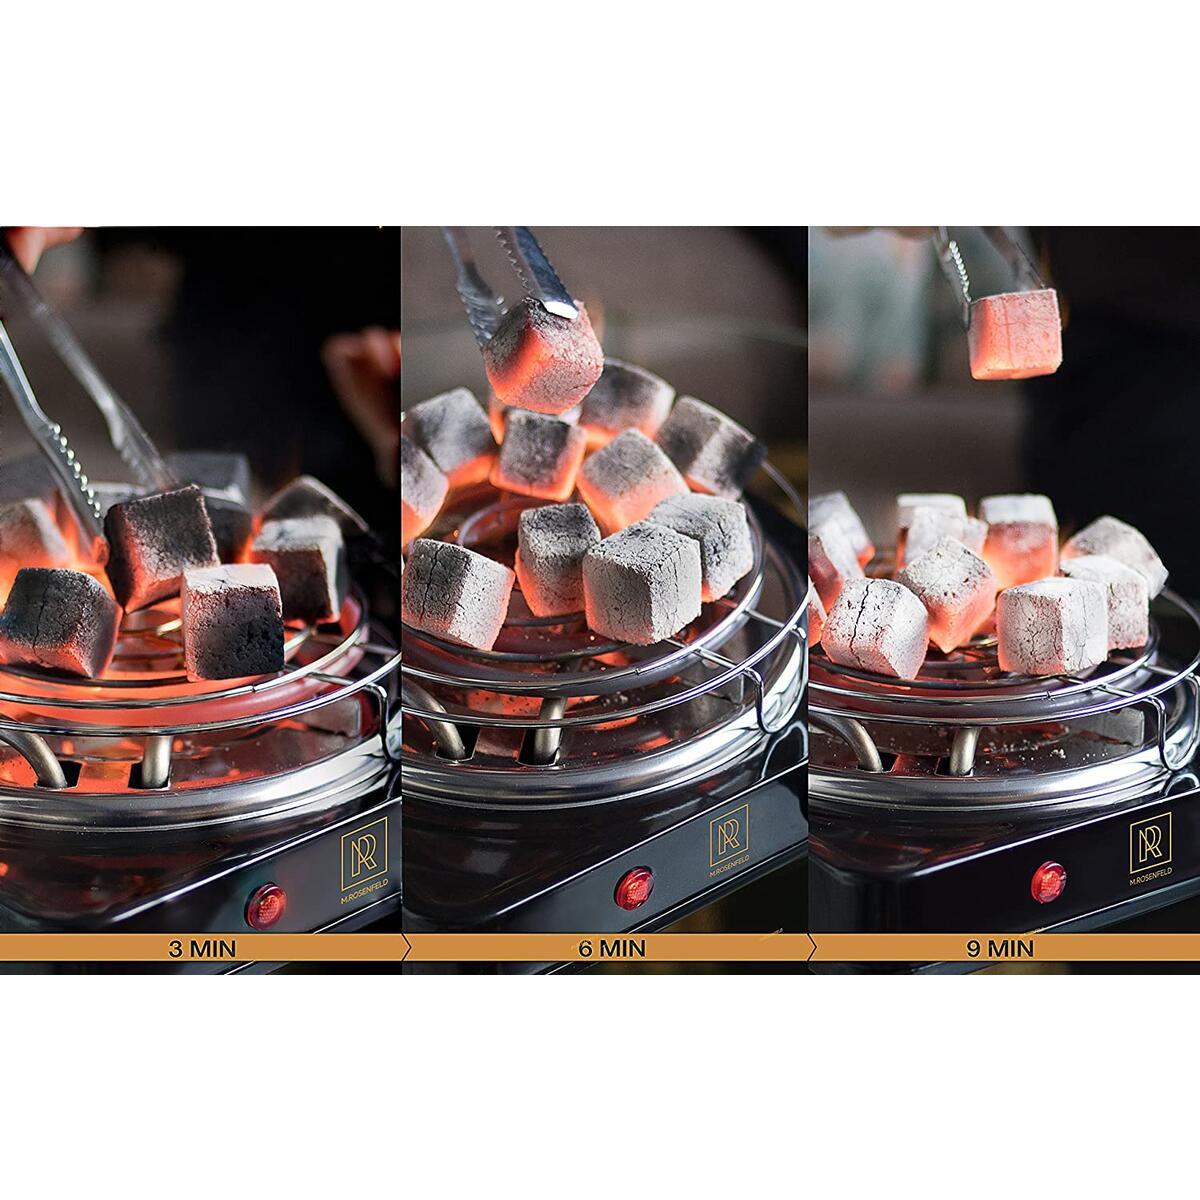 Premium Natural Coconut Hookah Coals - 84 PCS and 1.2 Kg Hookah Charcoal Cubes Low Ash Hookah Coal - 100% Hookah Accessories Shisha Narguile Coconut Shell Briquette - Square Charcoal For Hookah.